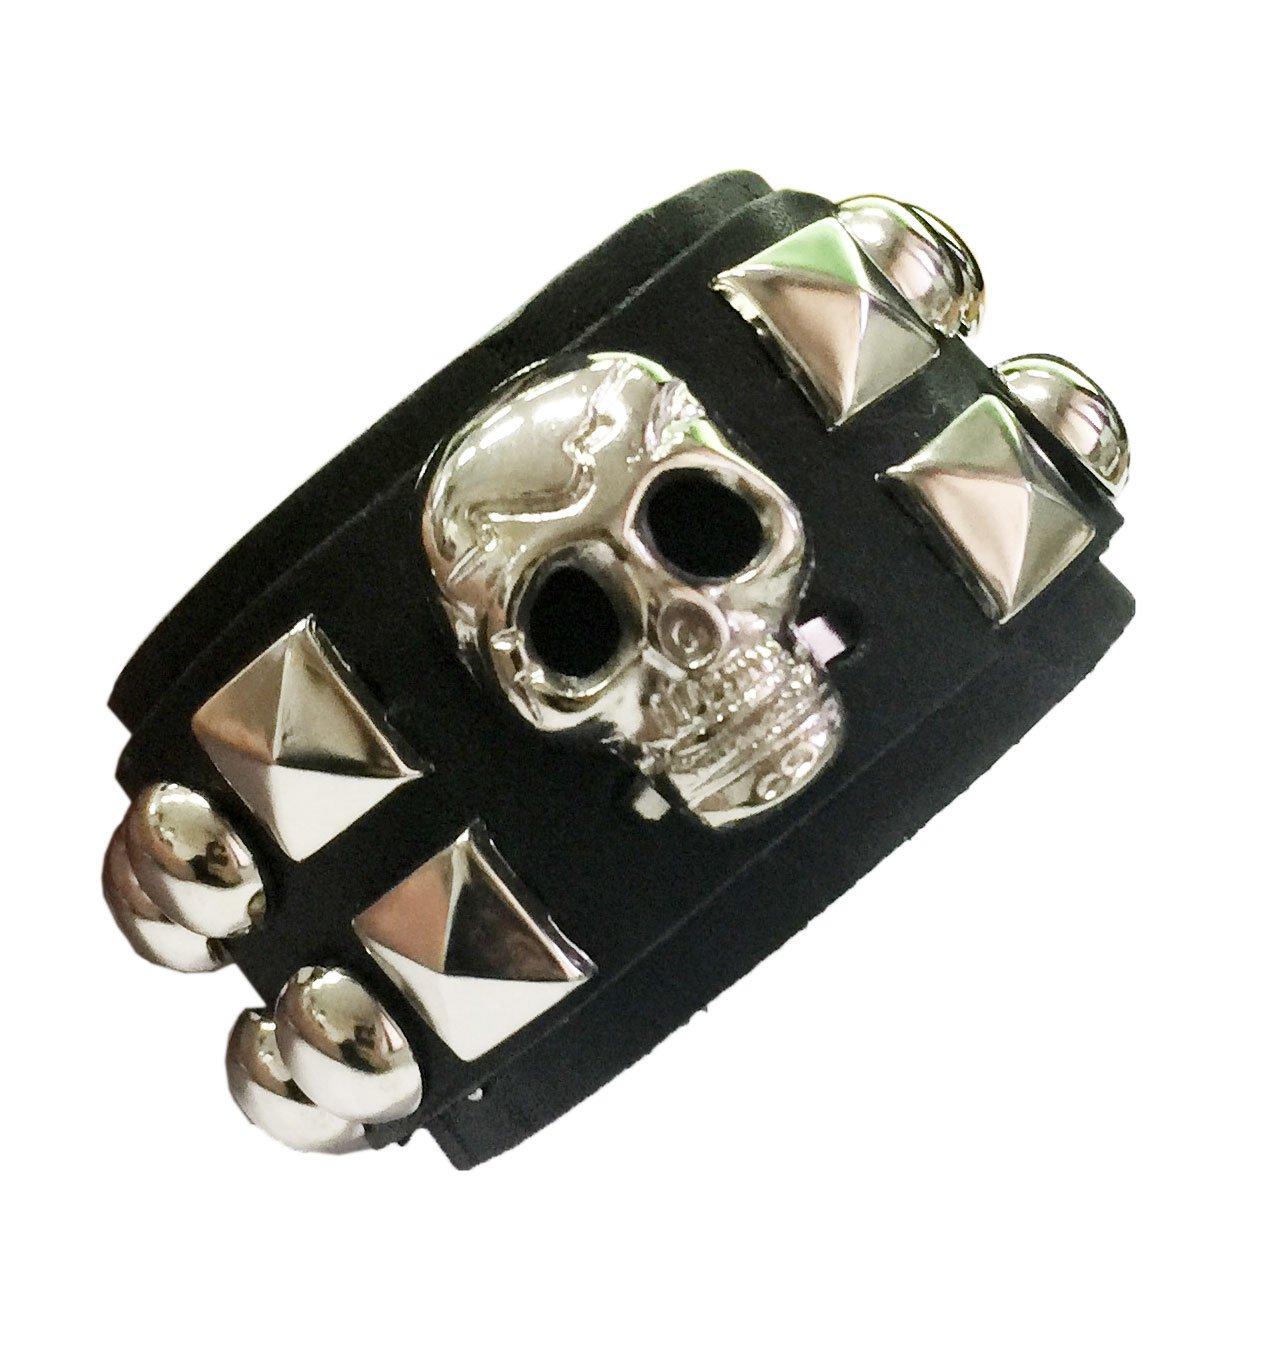 D'SHARK 1.5'' Wide Skull Design Biker Leather Bangle Cuff Bracelet Wristband for Unisex (Black3)